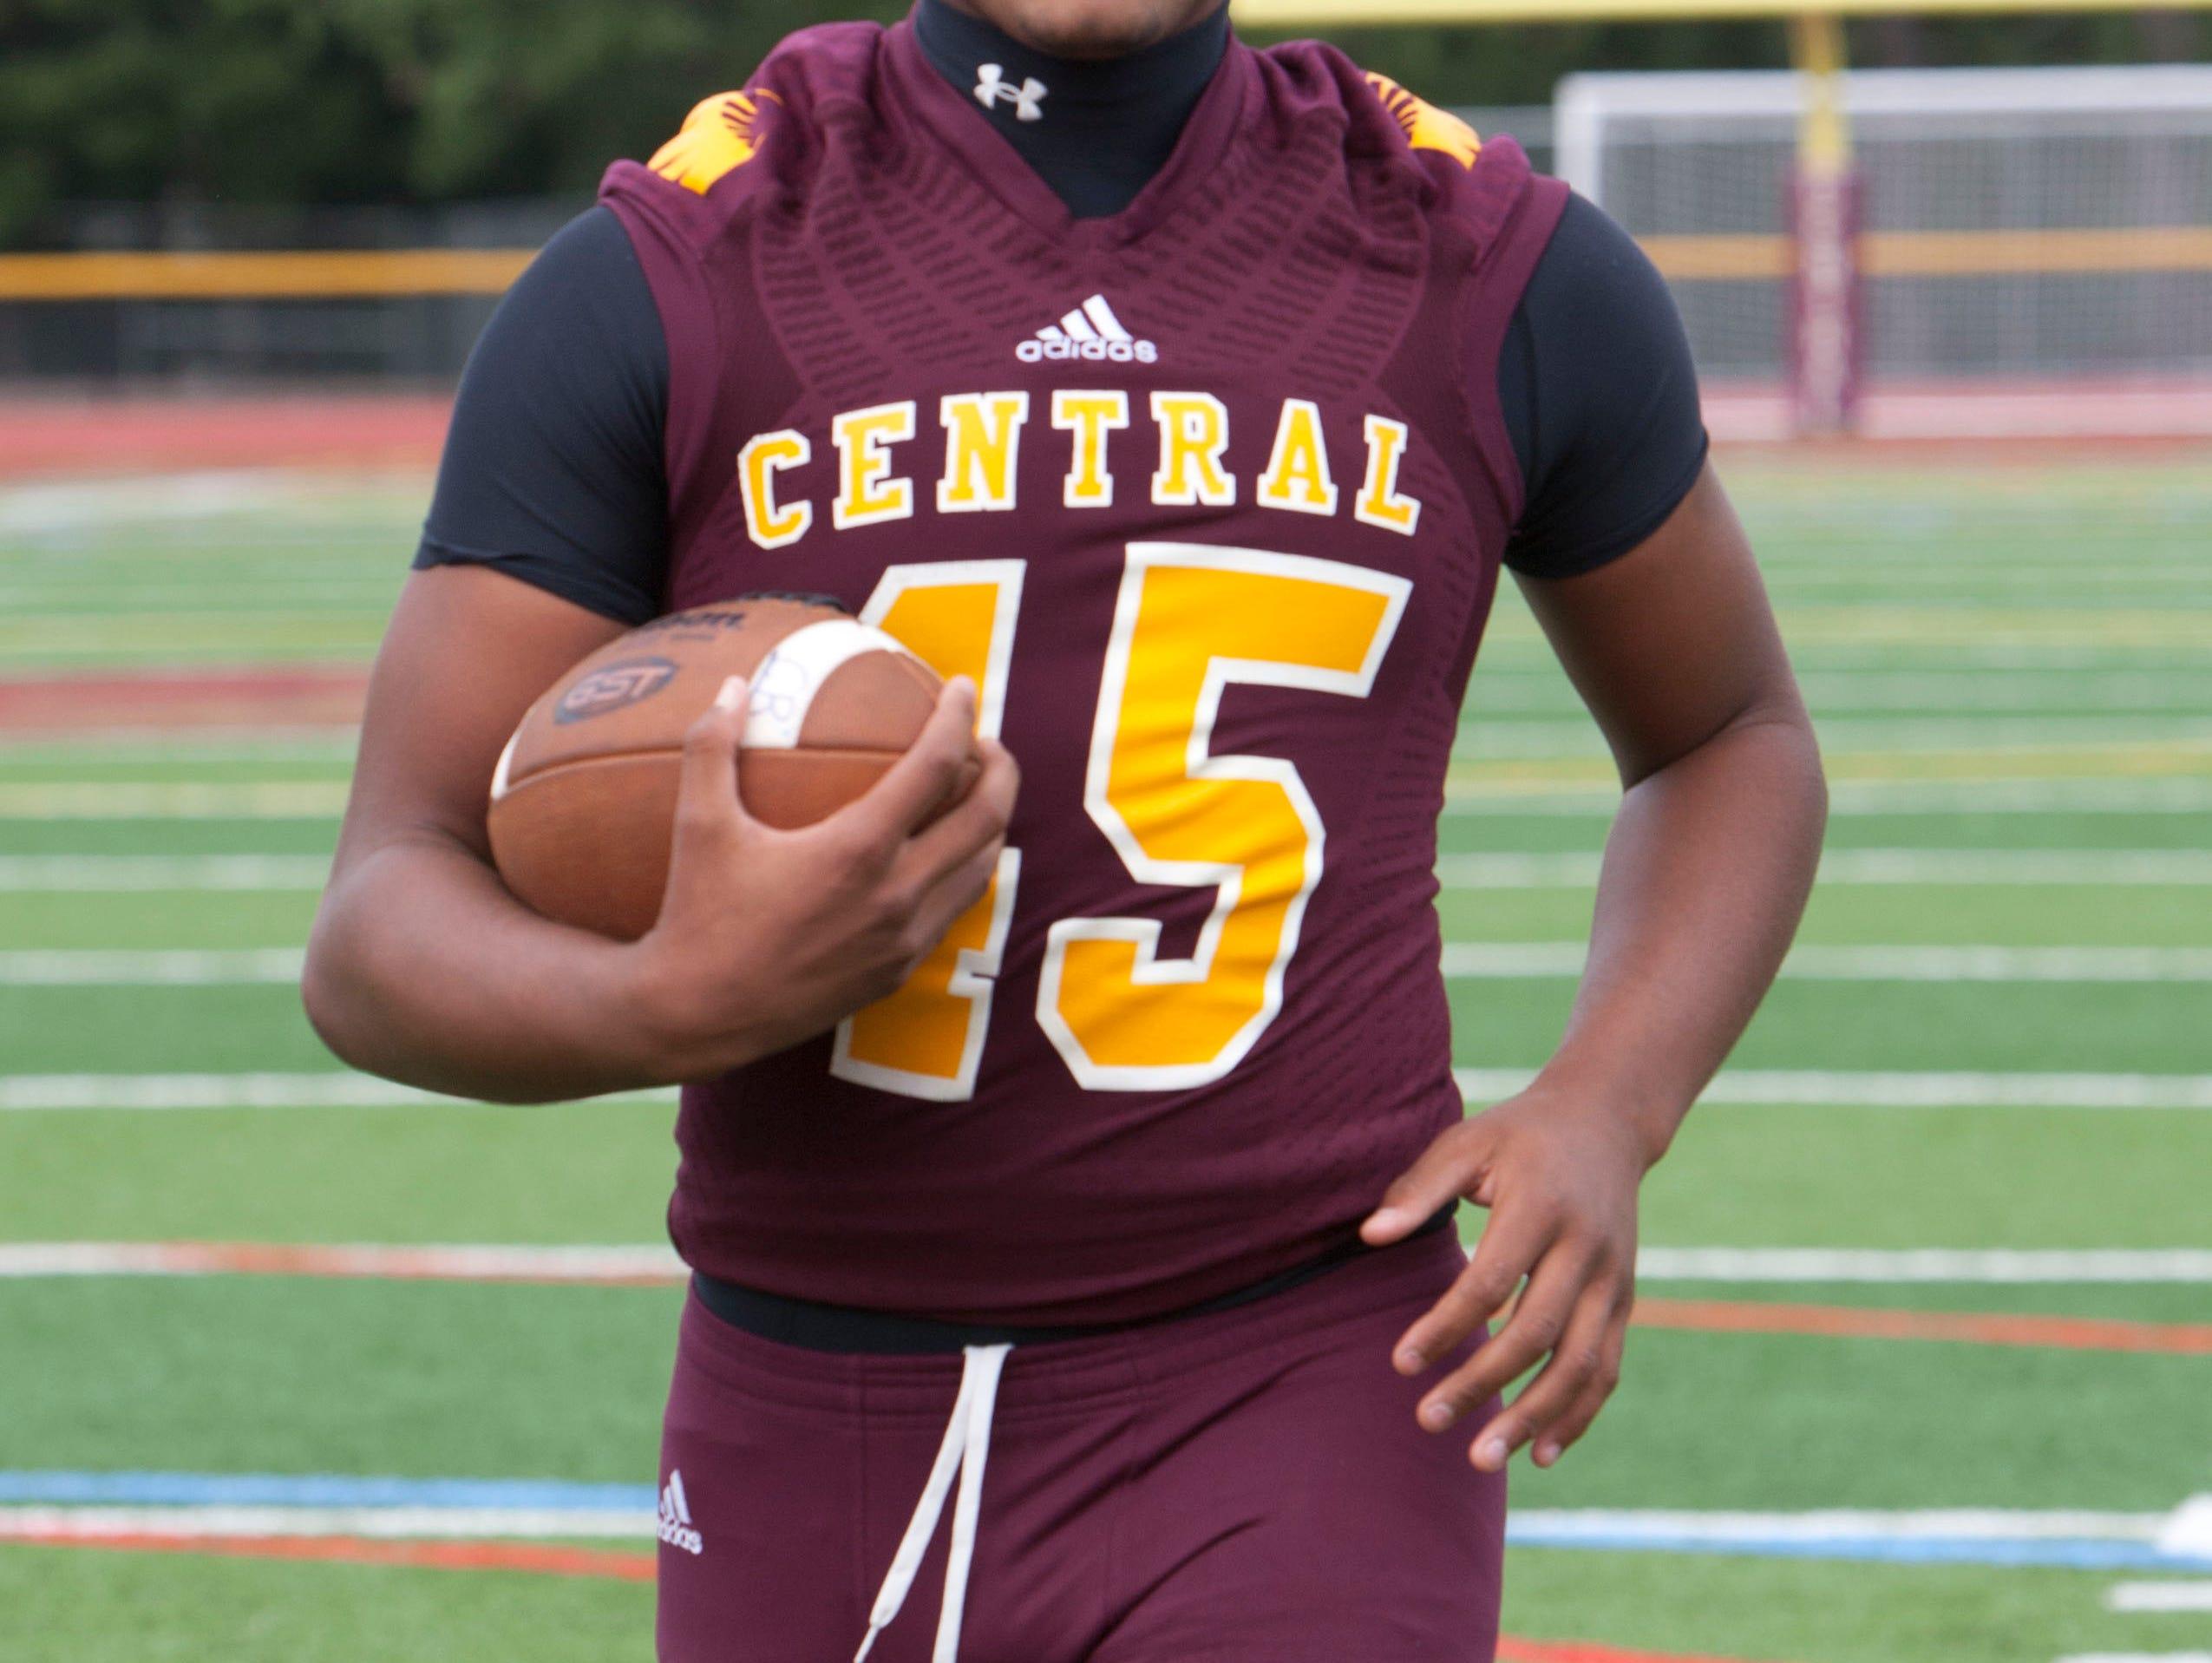 Denis Corbin, a Central Regional football player, was named defensive player of the week-September 21, 2015-Berkeley, NJ.-Staff photographer/Bob Bielk/Asbury Park Press